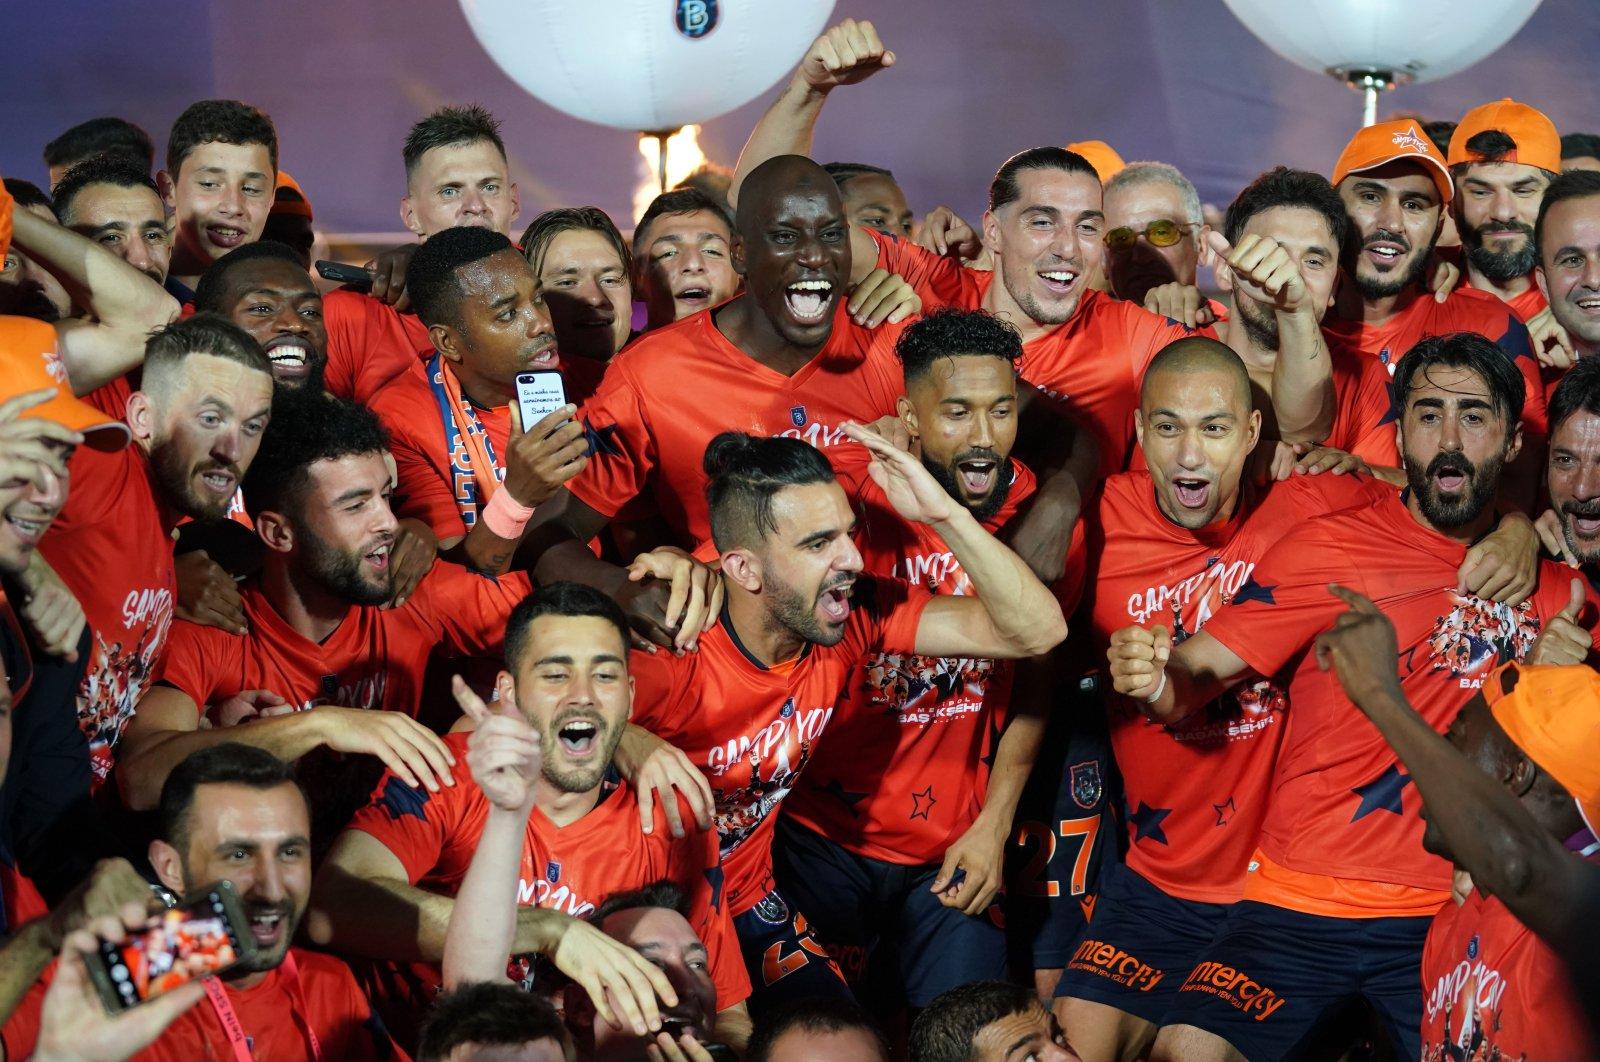 Başakşehir pose for a photo after winning the Turkish Süper Lig, Istanbul, Turkey, July 19, 2020. (IHA Photo)